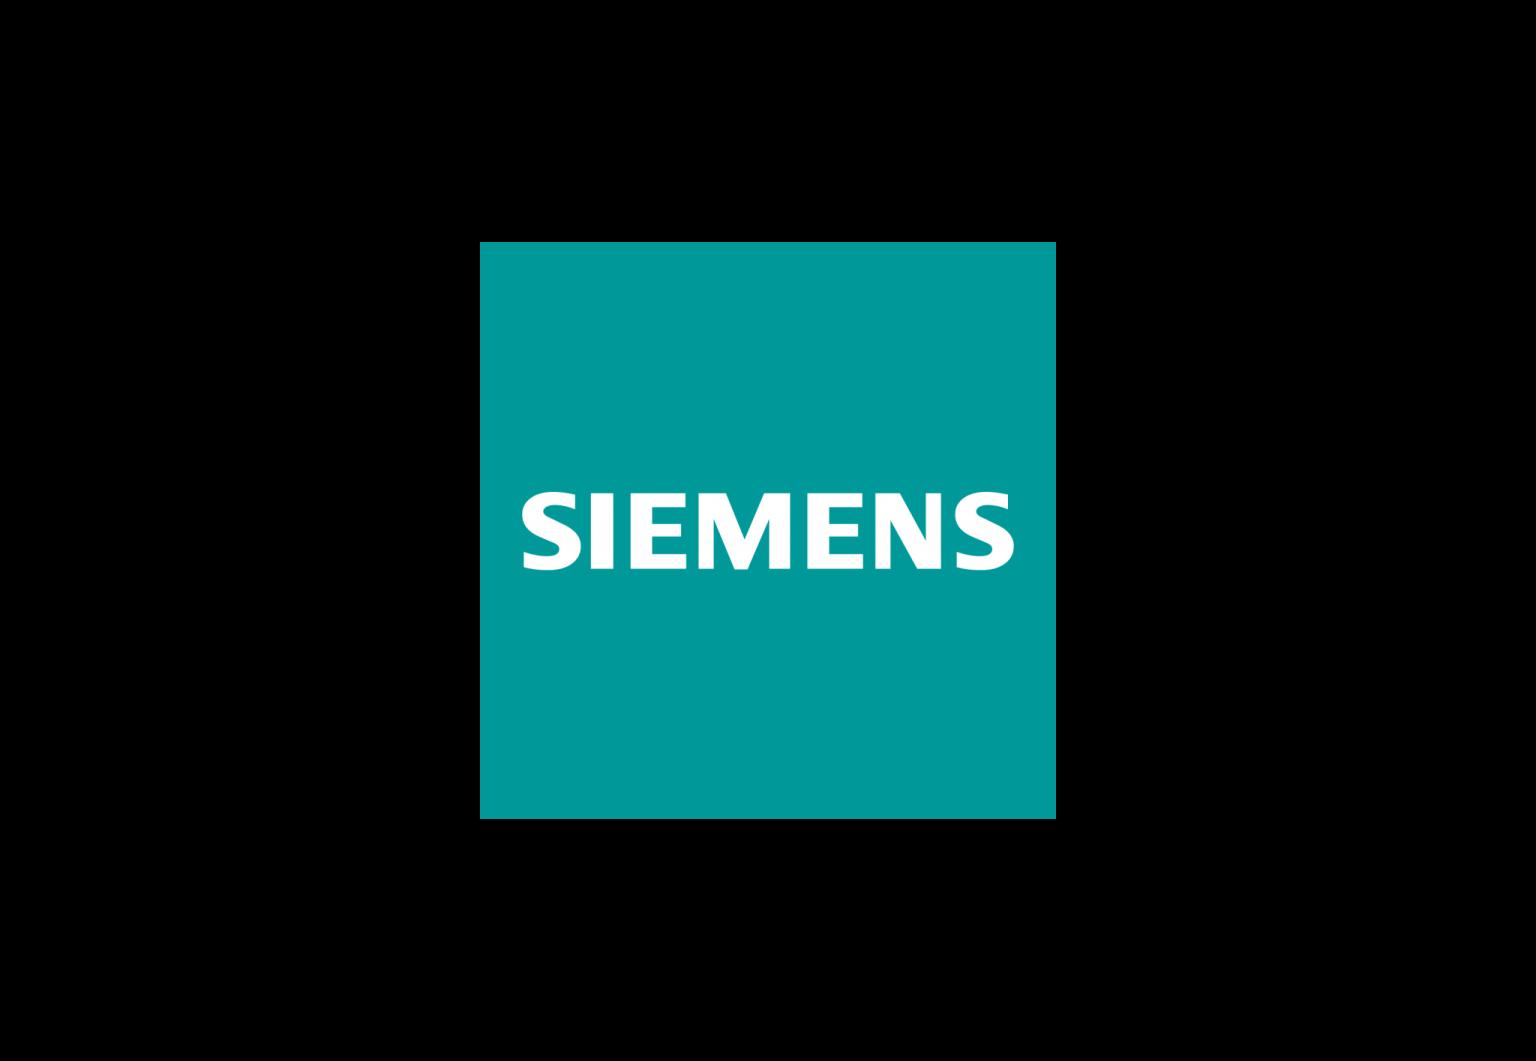 3200px-siemens_logo.png